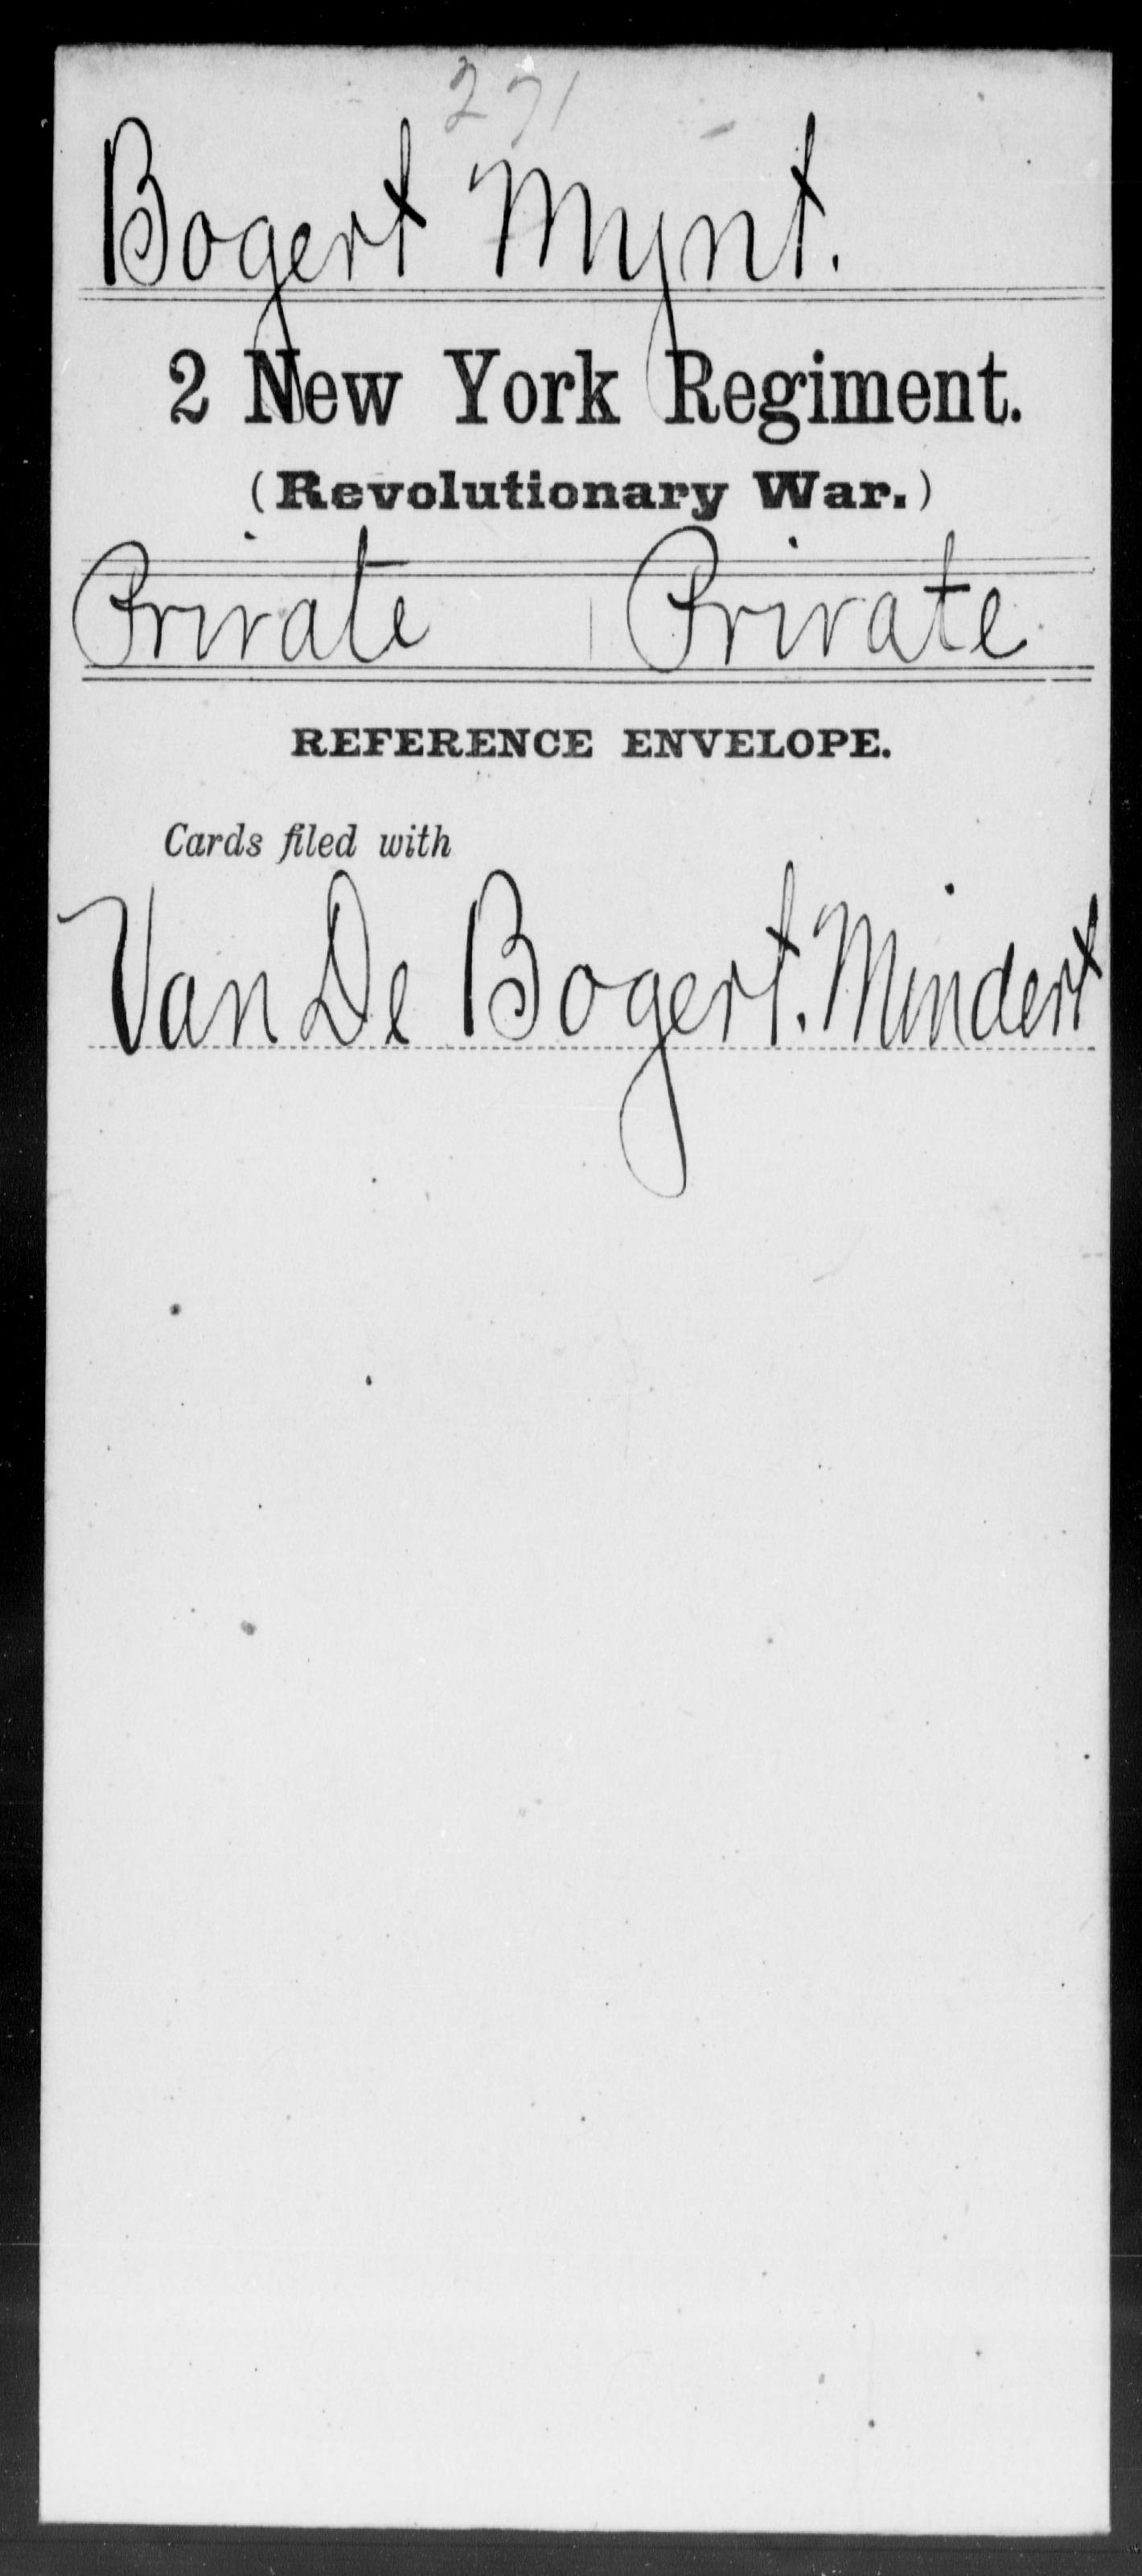 Bogert, Mynt - New York - Second Regiment